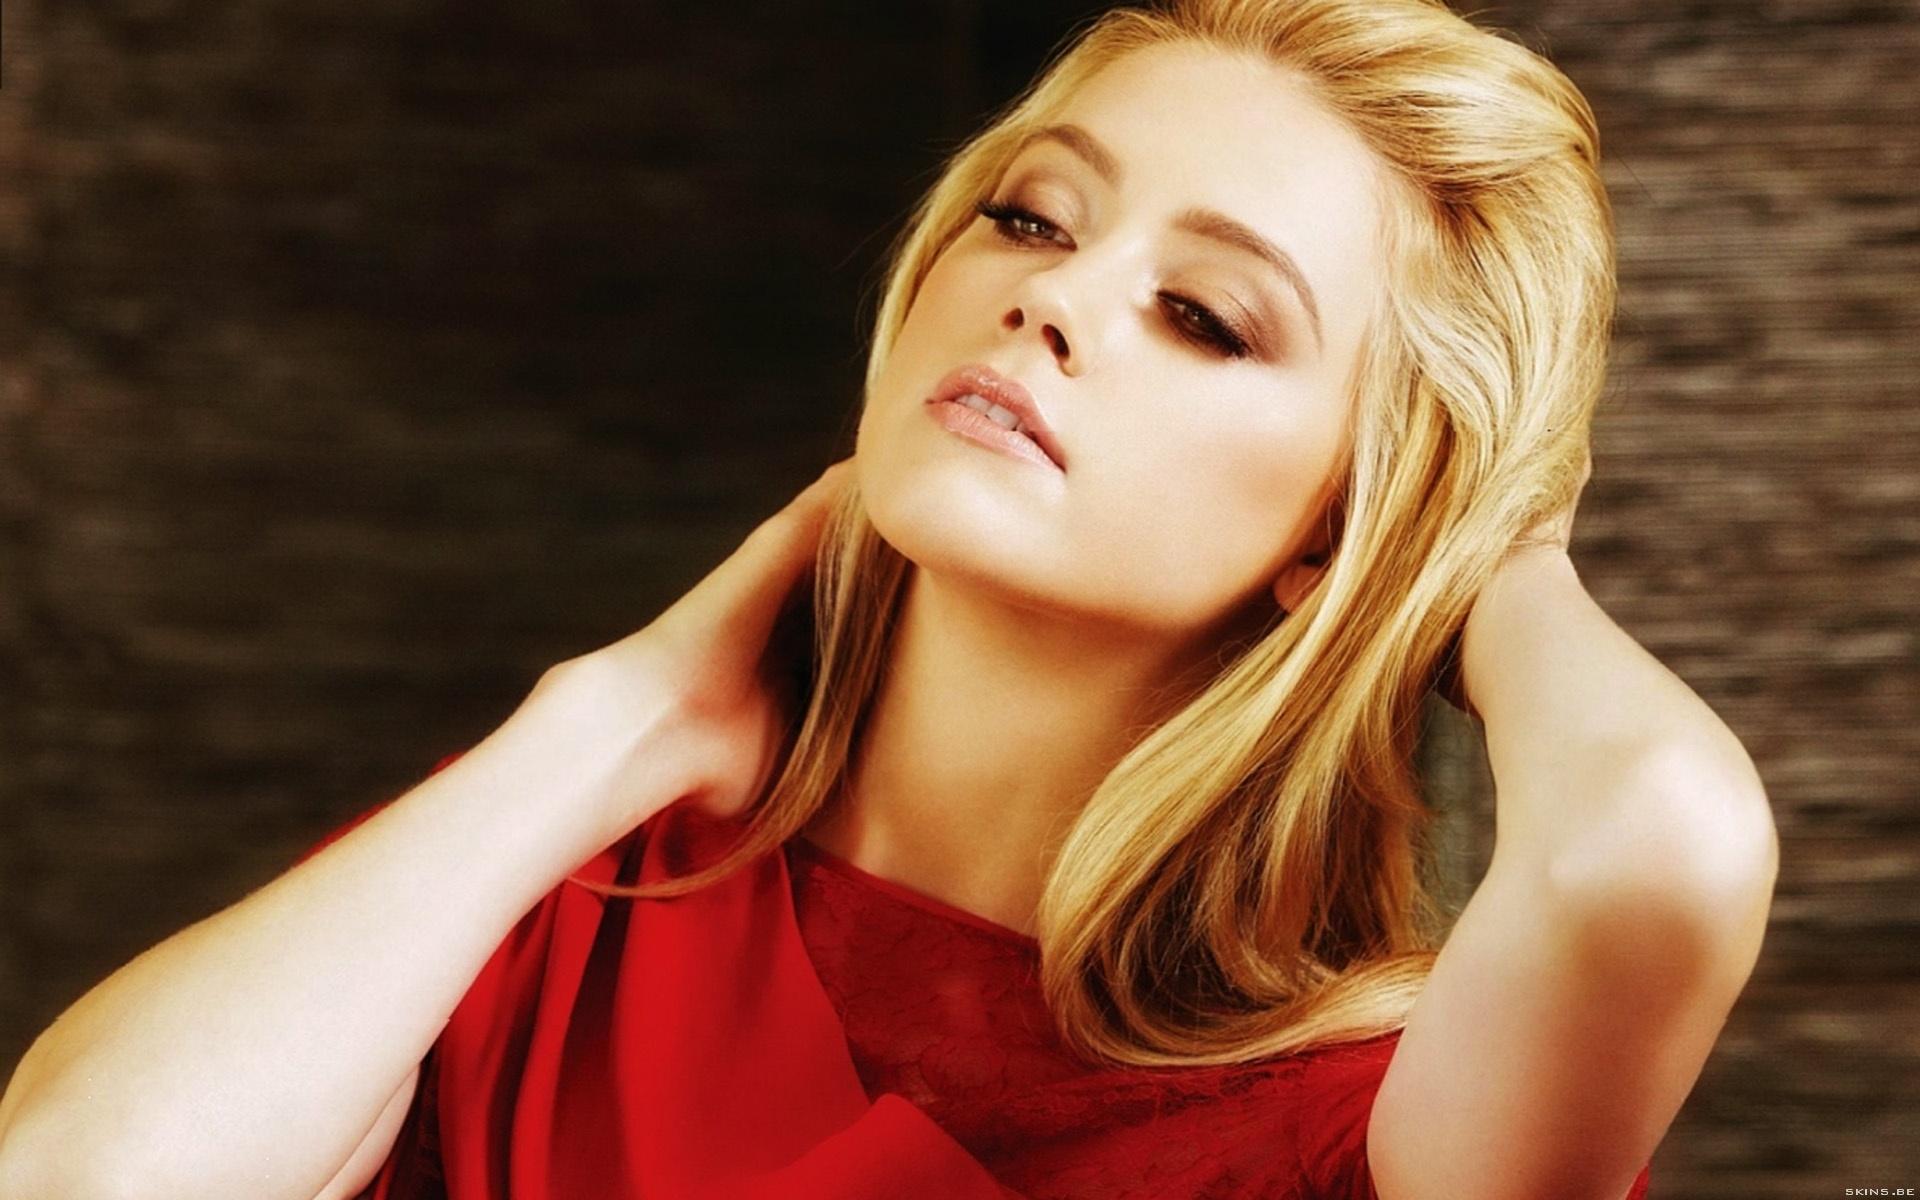 Amber Heard Hd Wallpapers For Desktop Download, - Amber Heard , HD Wallpaper & Backgrounds